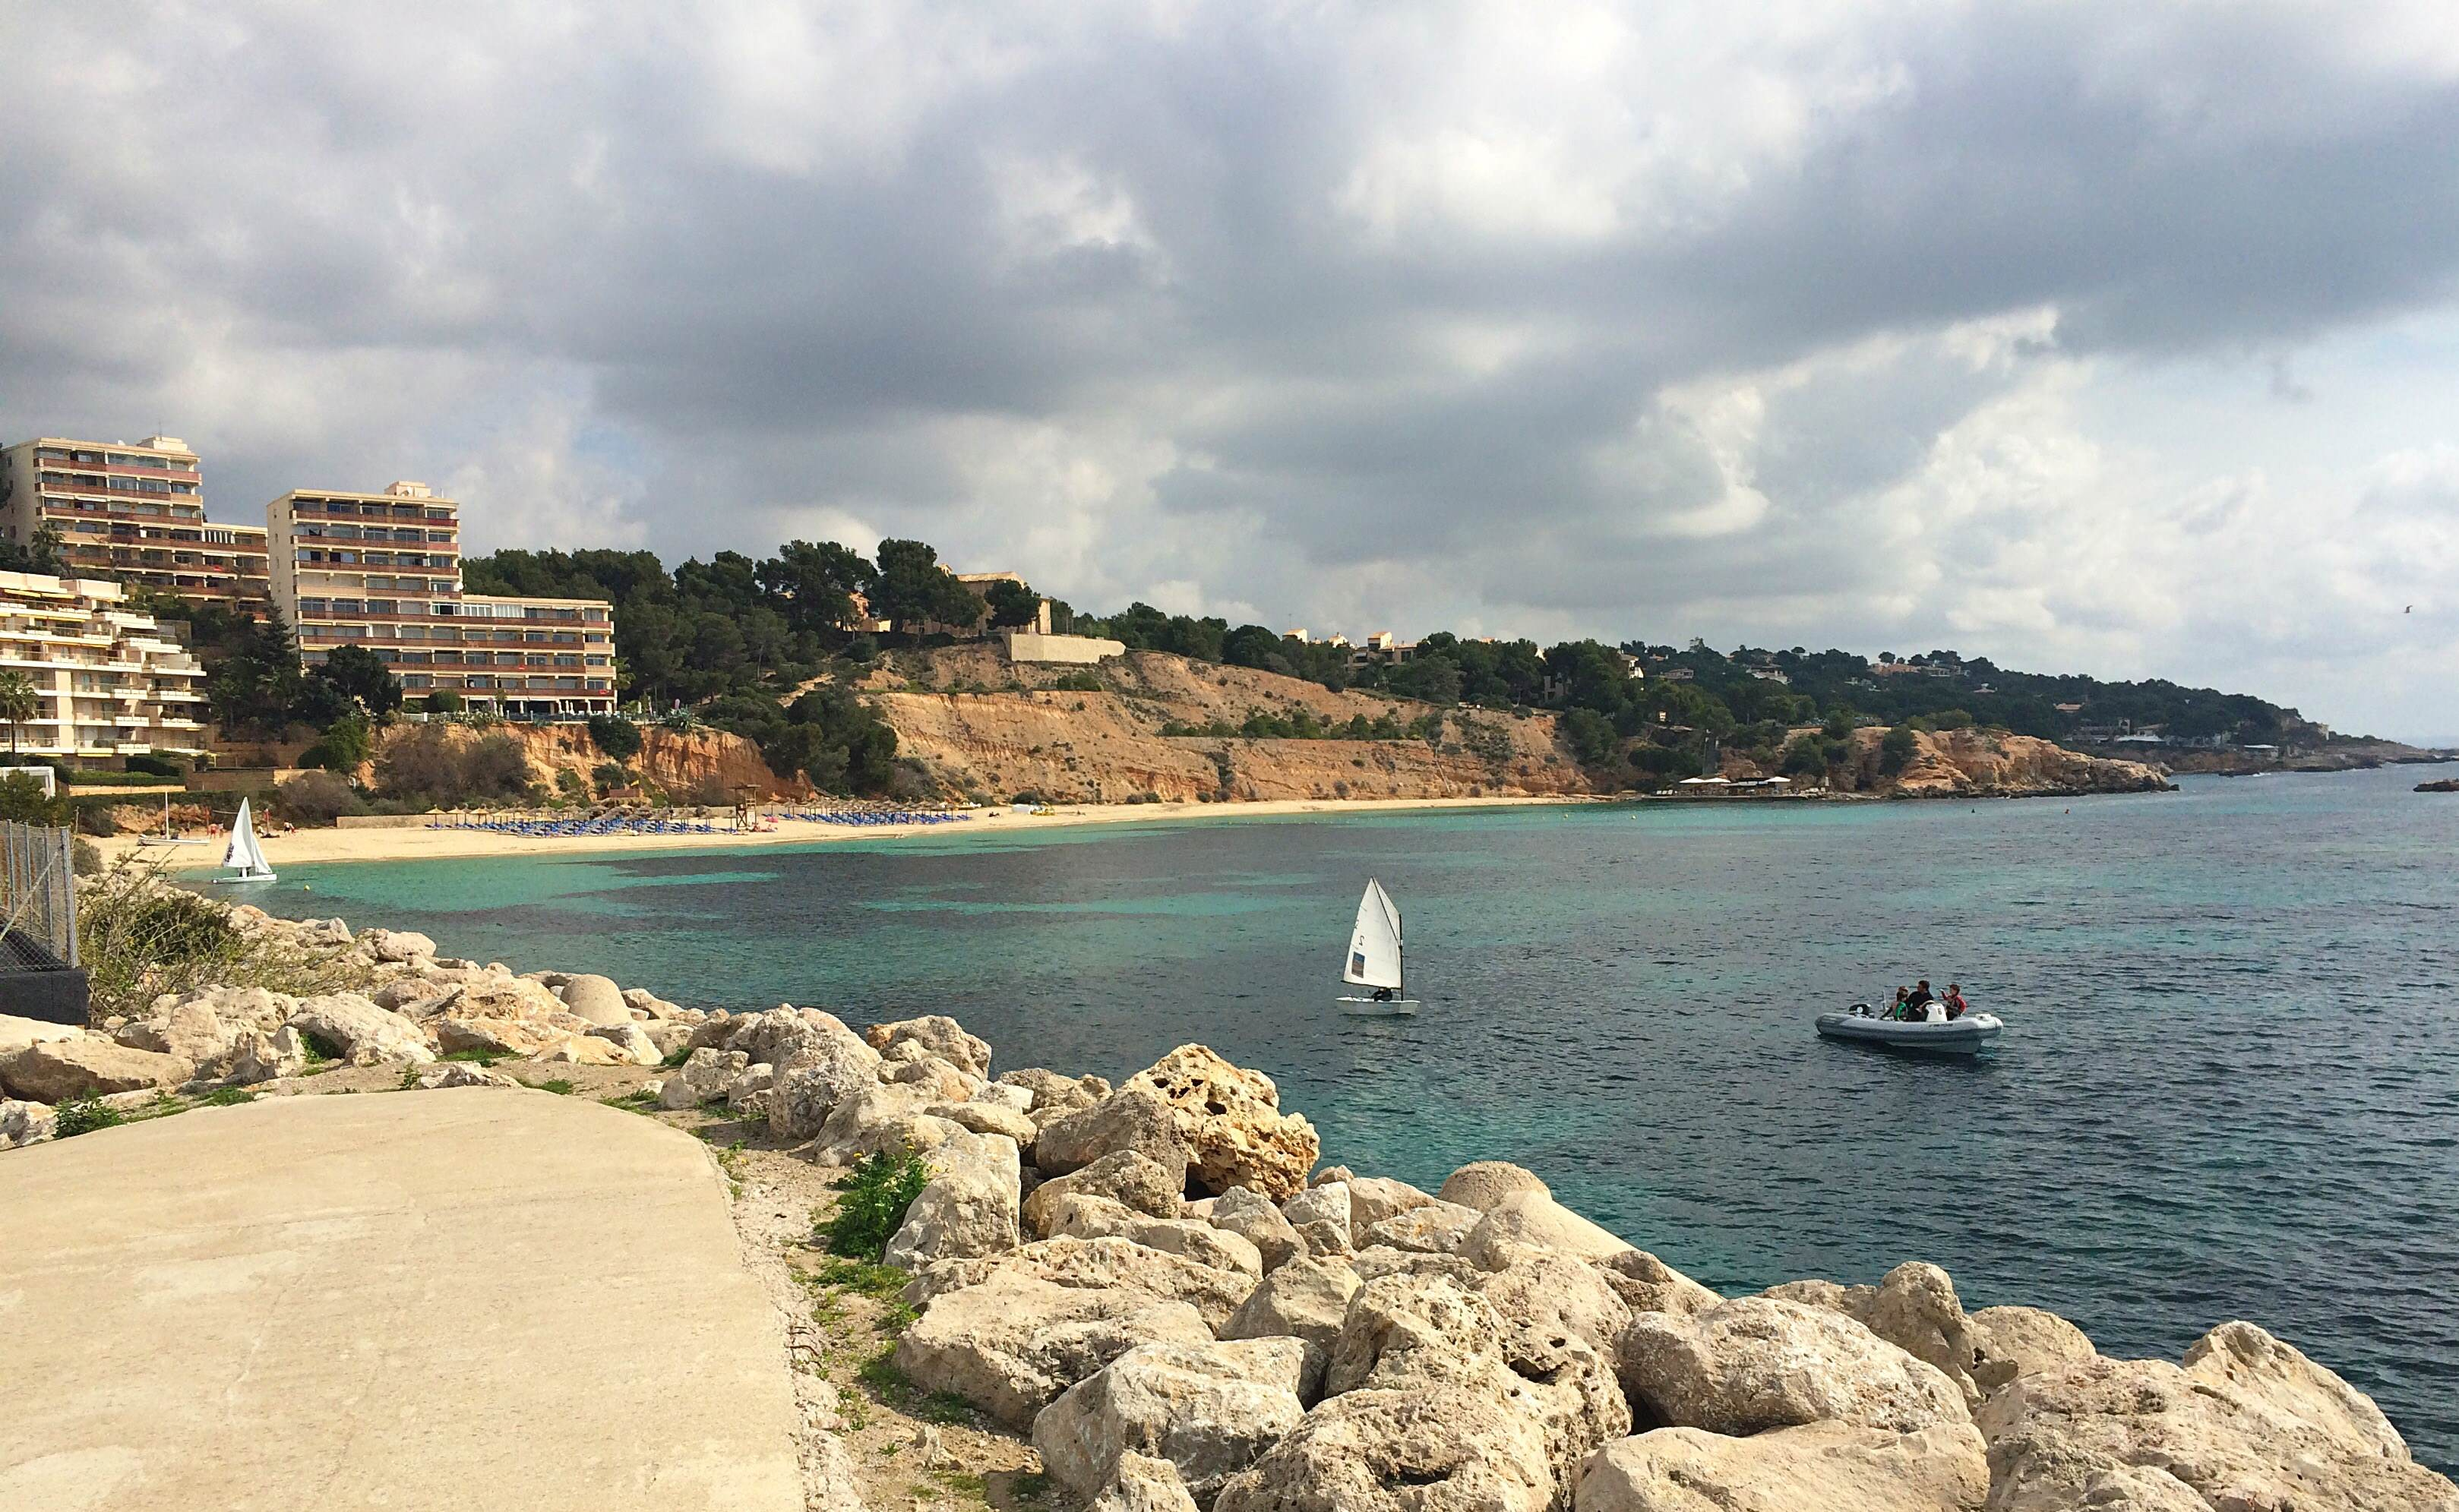 Mein perfektes Mallorca Wochenende staedtereisen sonne land und leute mallorca familie europa  tui berlin mallorca bucht portals nous